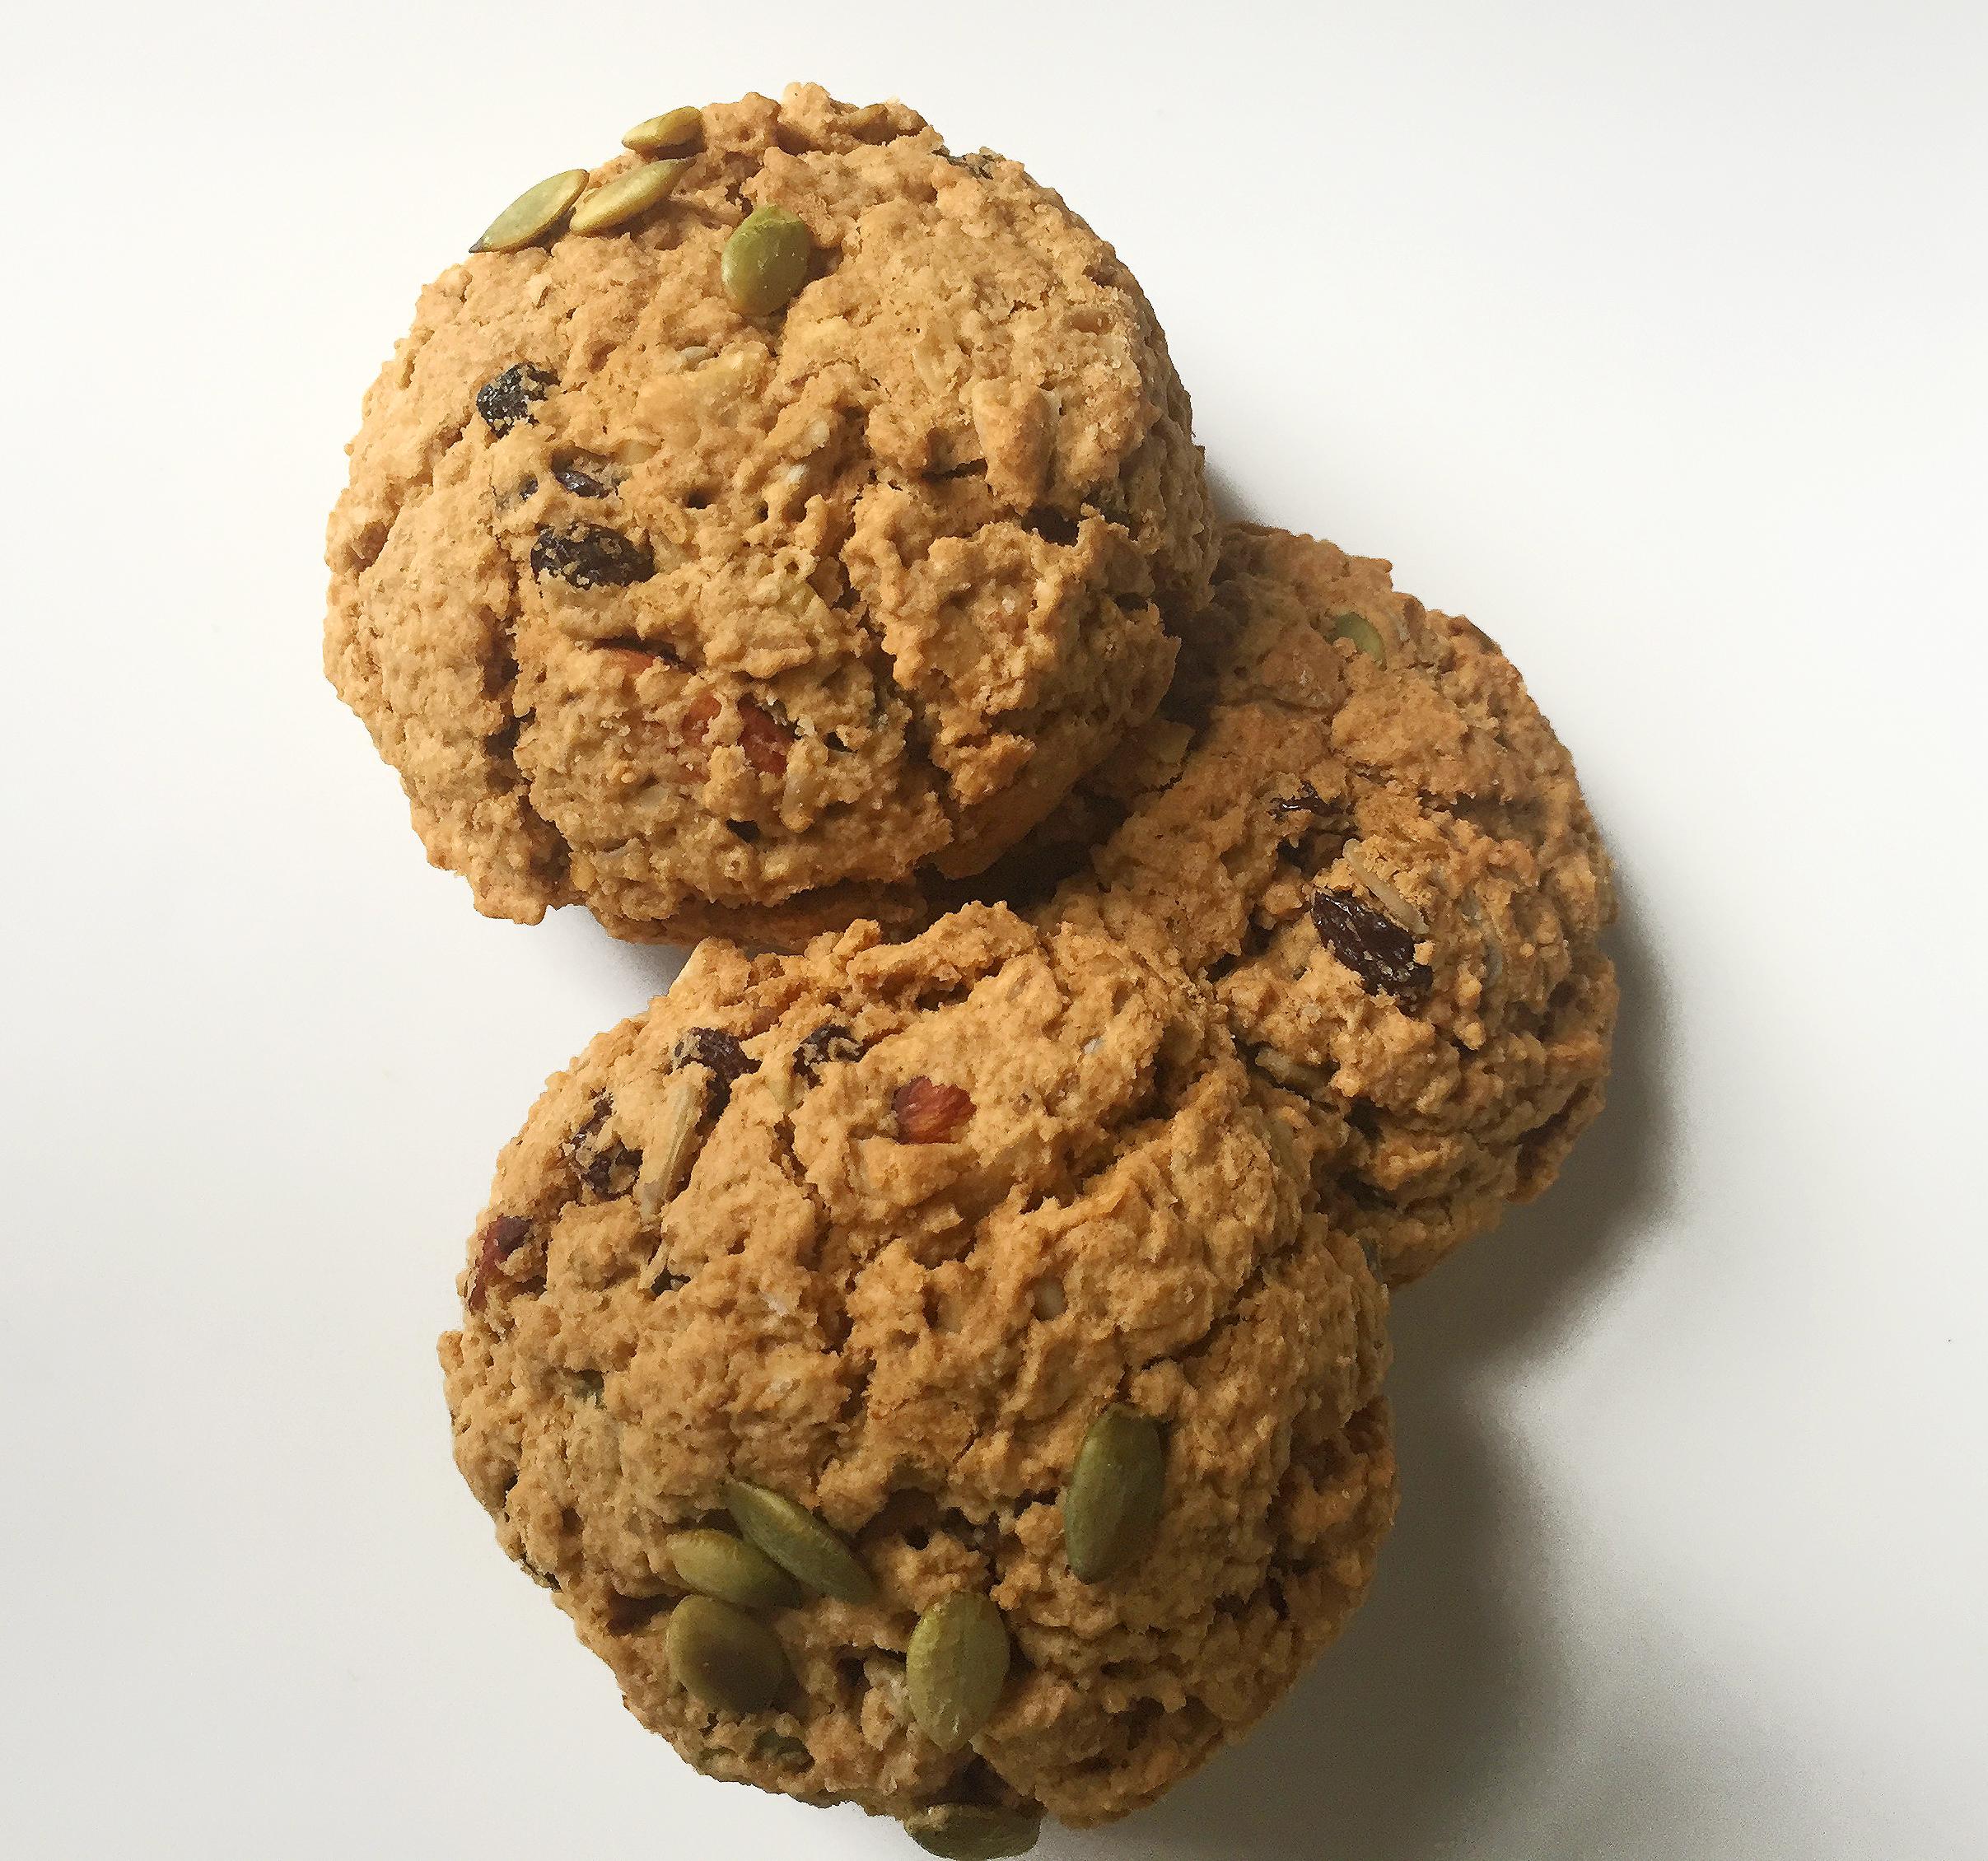 The Vegan Gluten-free Cookie.